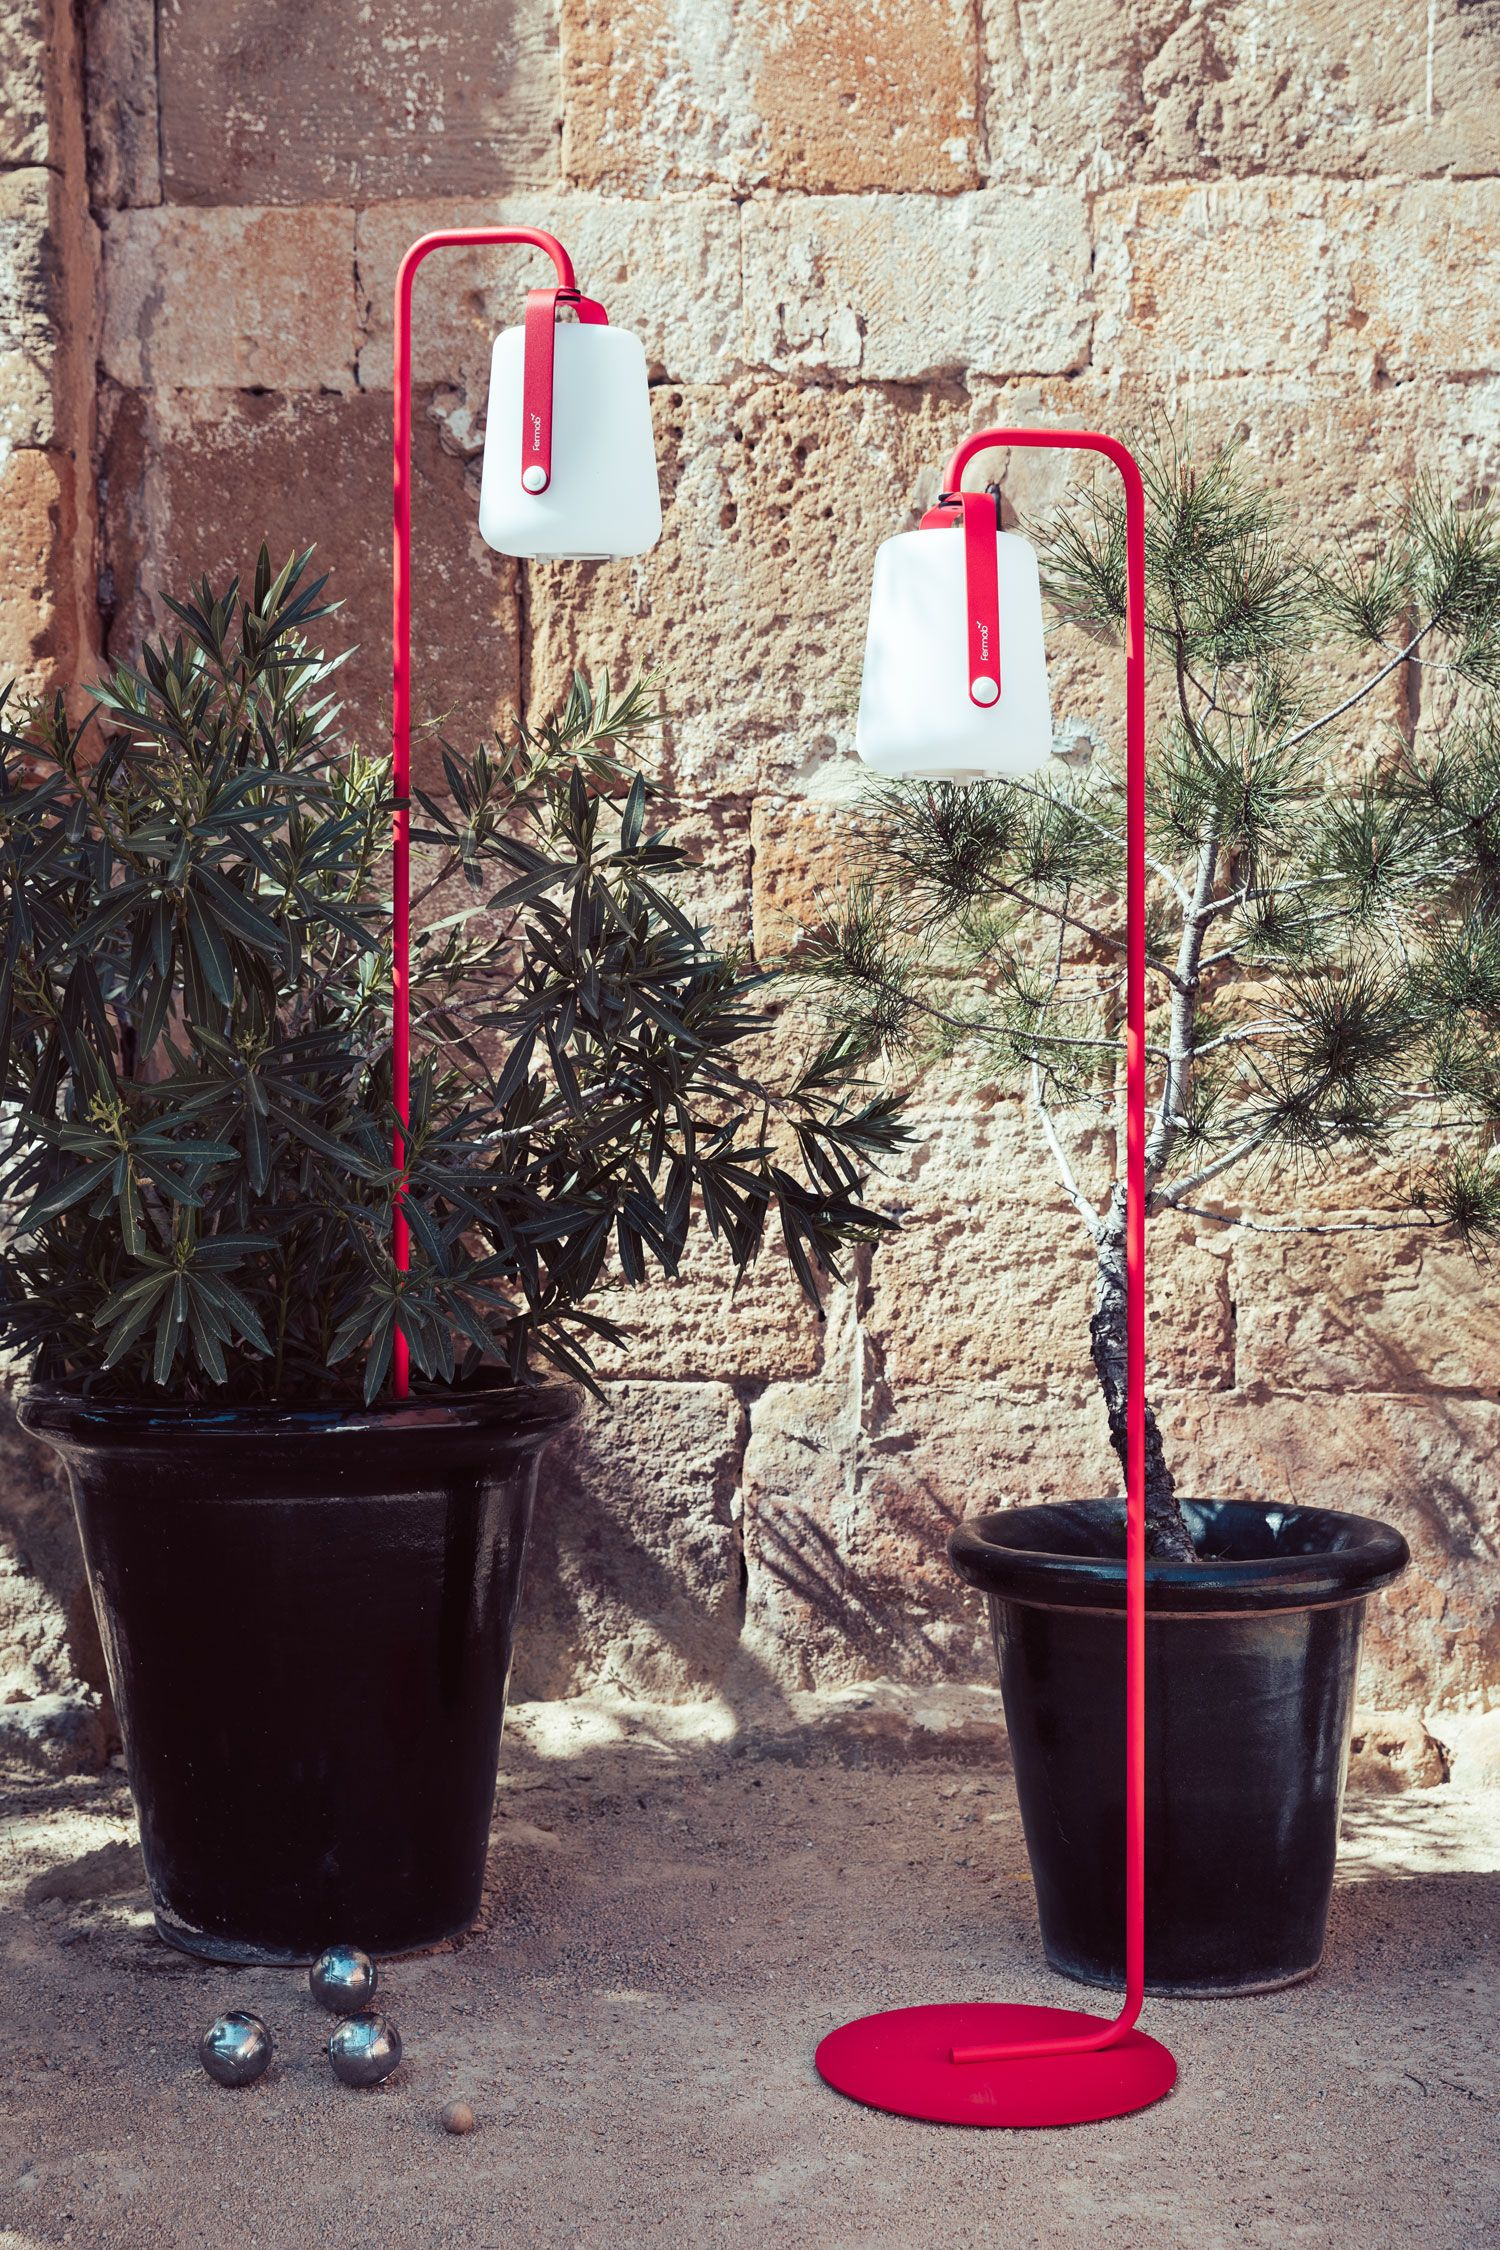 Einfacher Fuss Balad Fuss Fur Balad Lampe In 2020 Colorful Garden Lamp Fermob